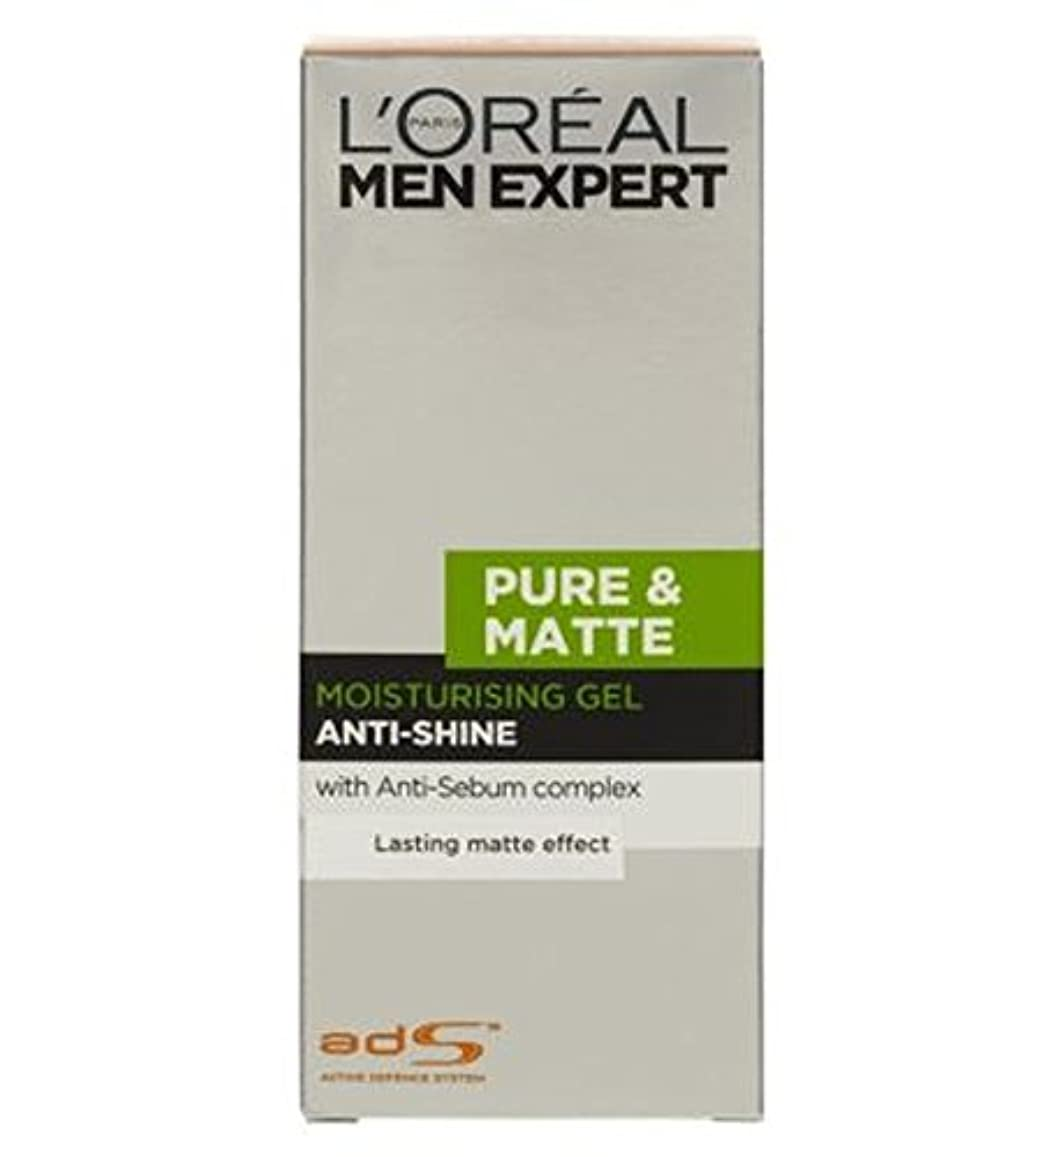 L'Oreal Men Expert Pure & Matte Anti-Shine Moisturising Gel 50ml - ロレアルの男性の専門家純粋&マット抗輝き保湿ゲル50ミリリットル (L'Oreal)...